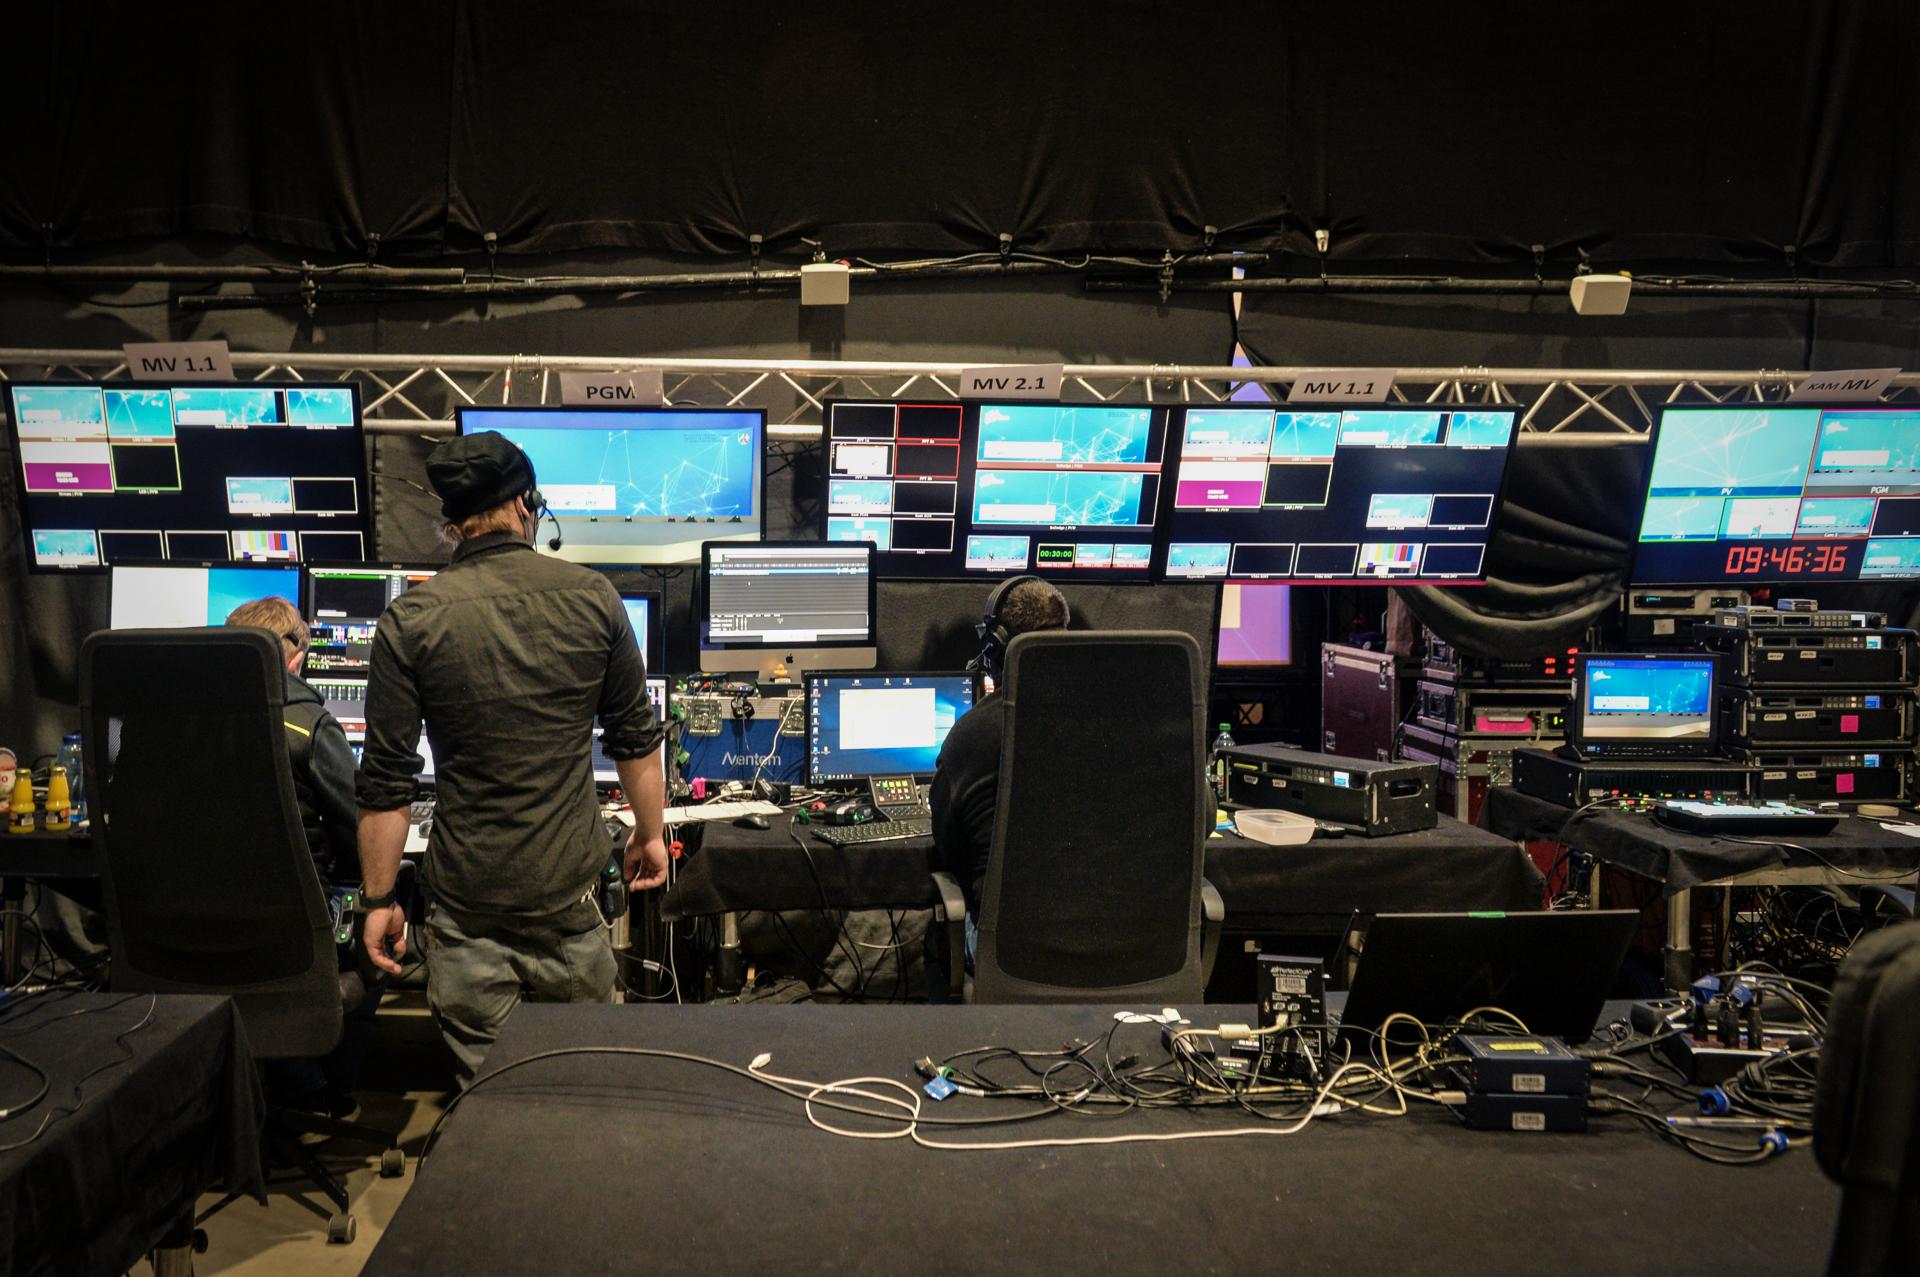 Technik-Raum des Aufnahmestudios